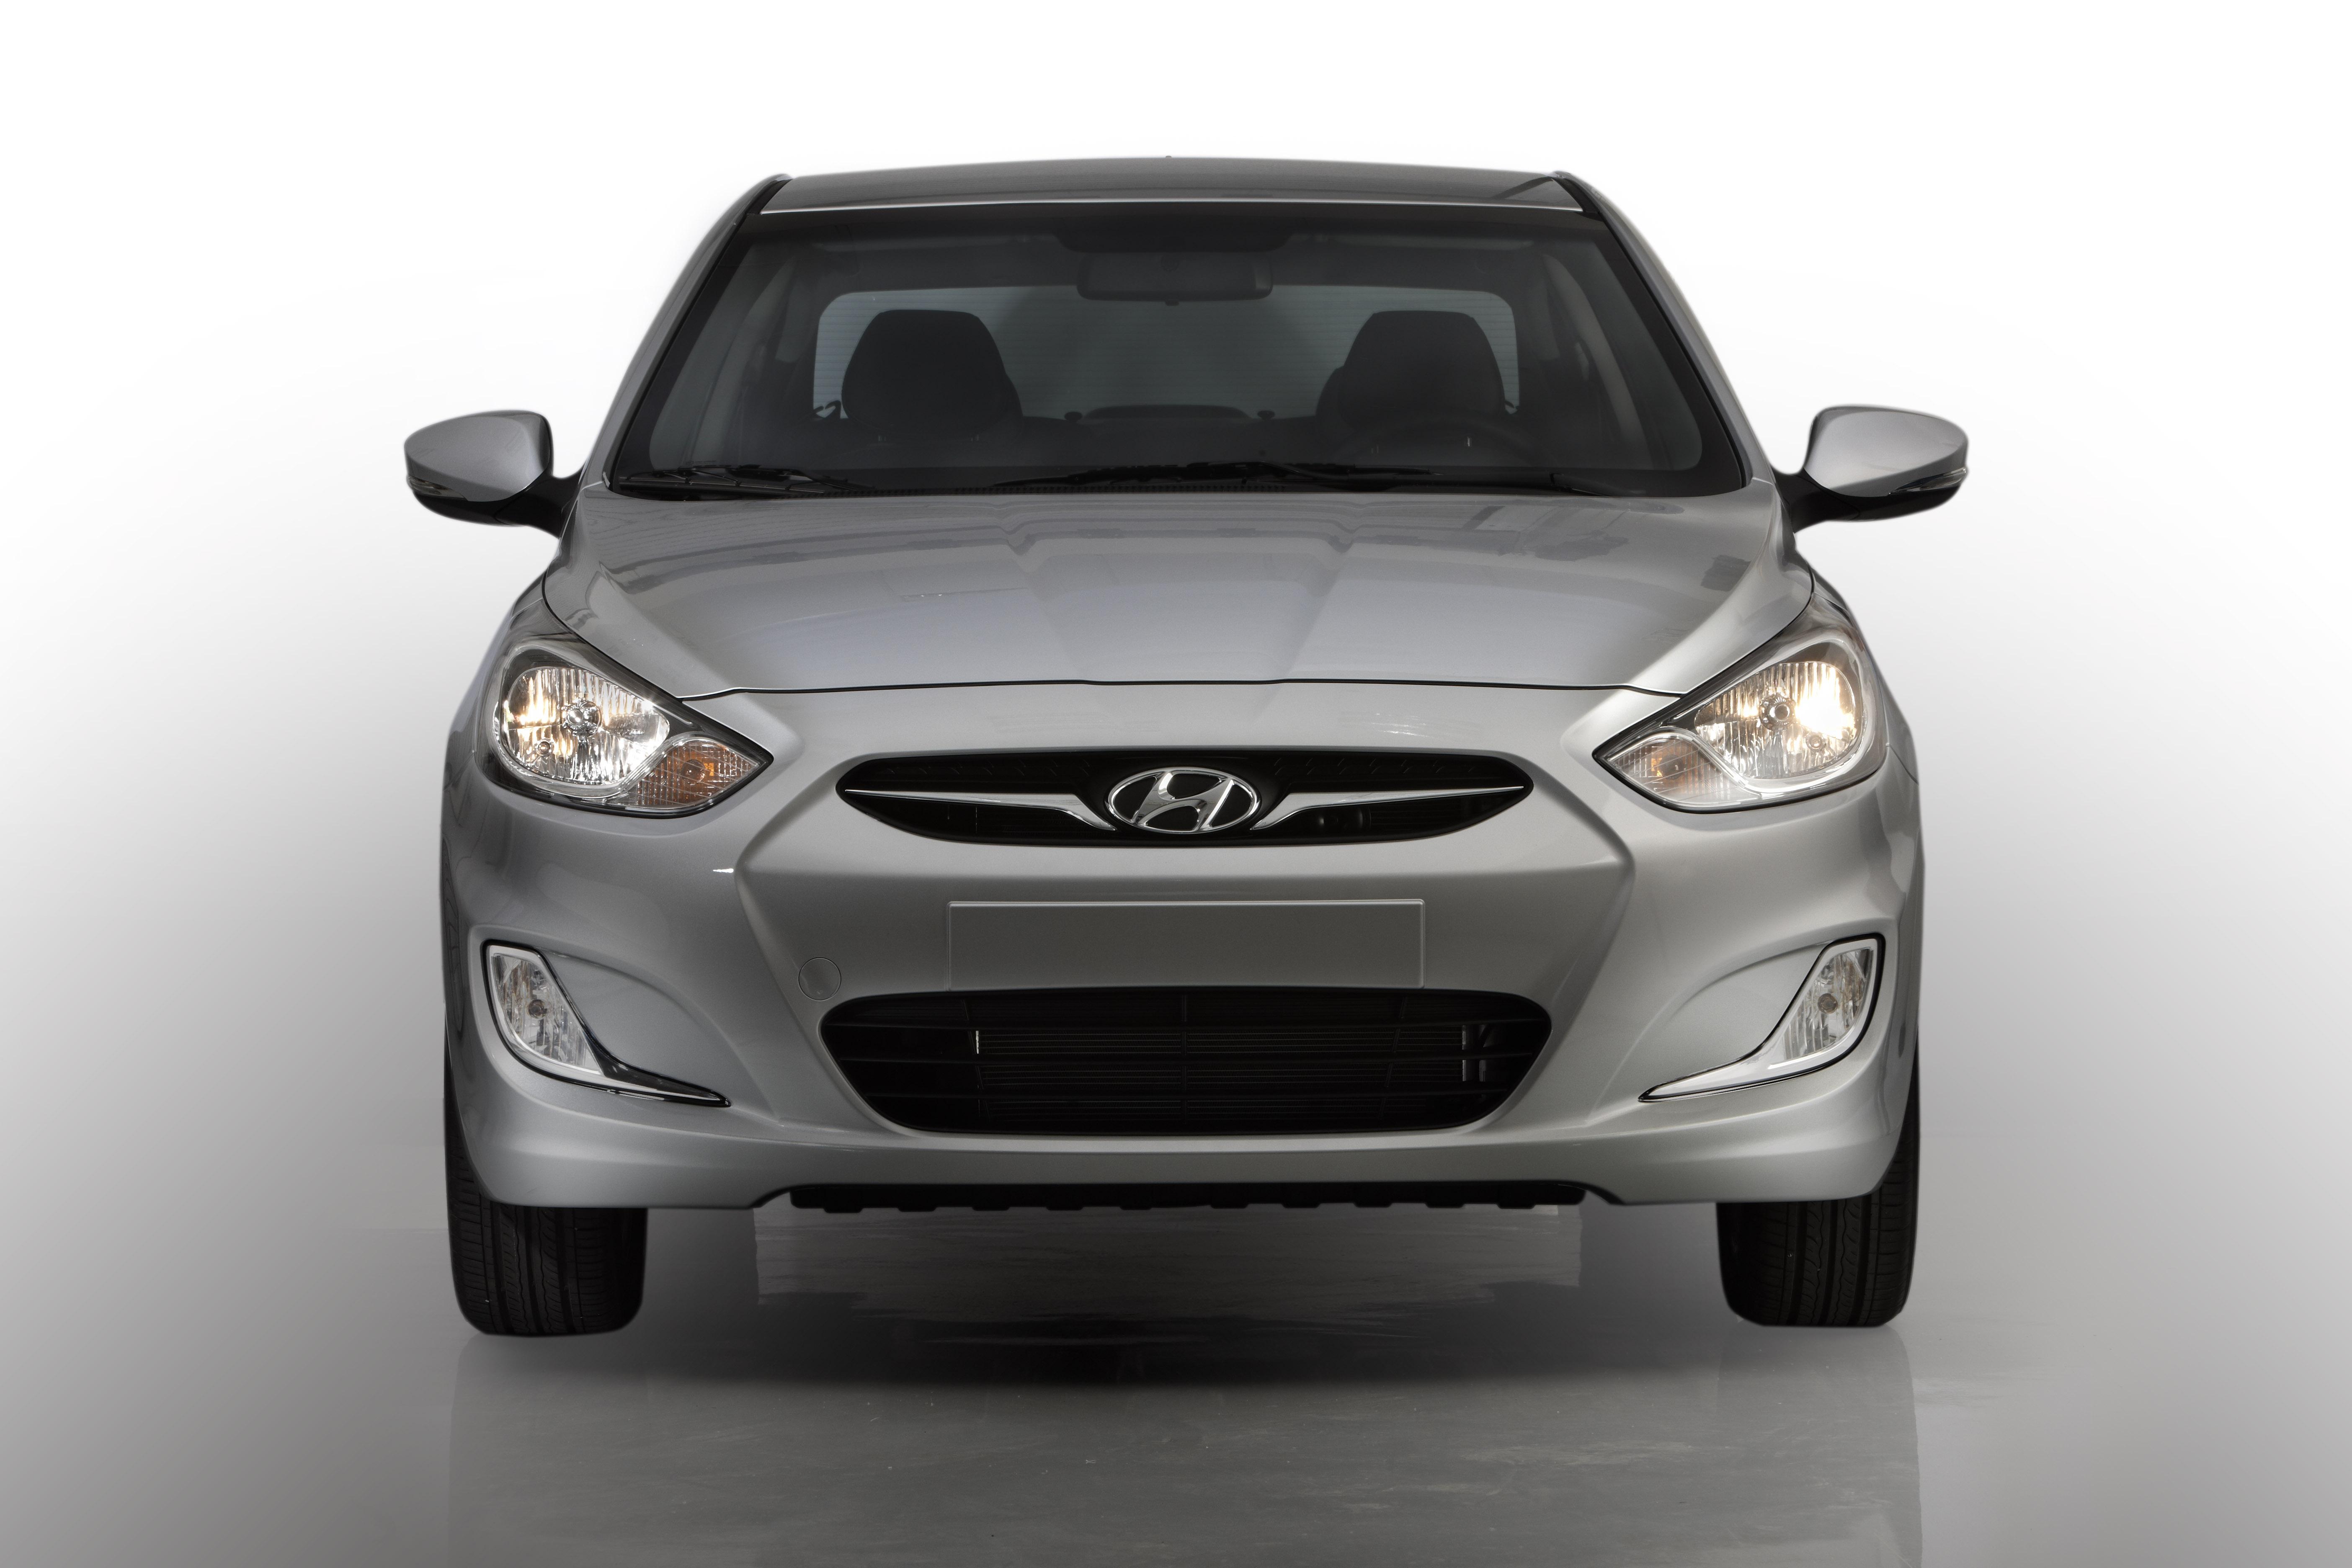 Rbr7 Hyundai Motor Company